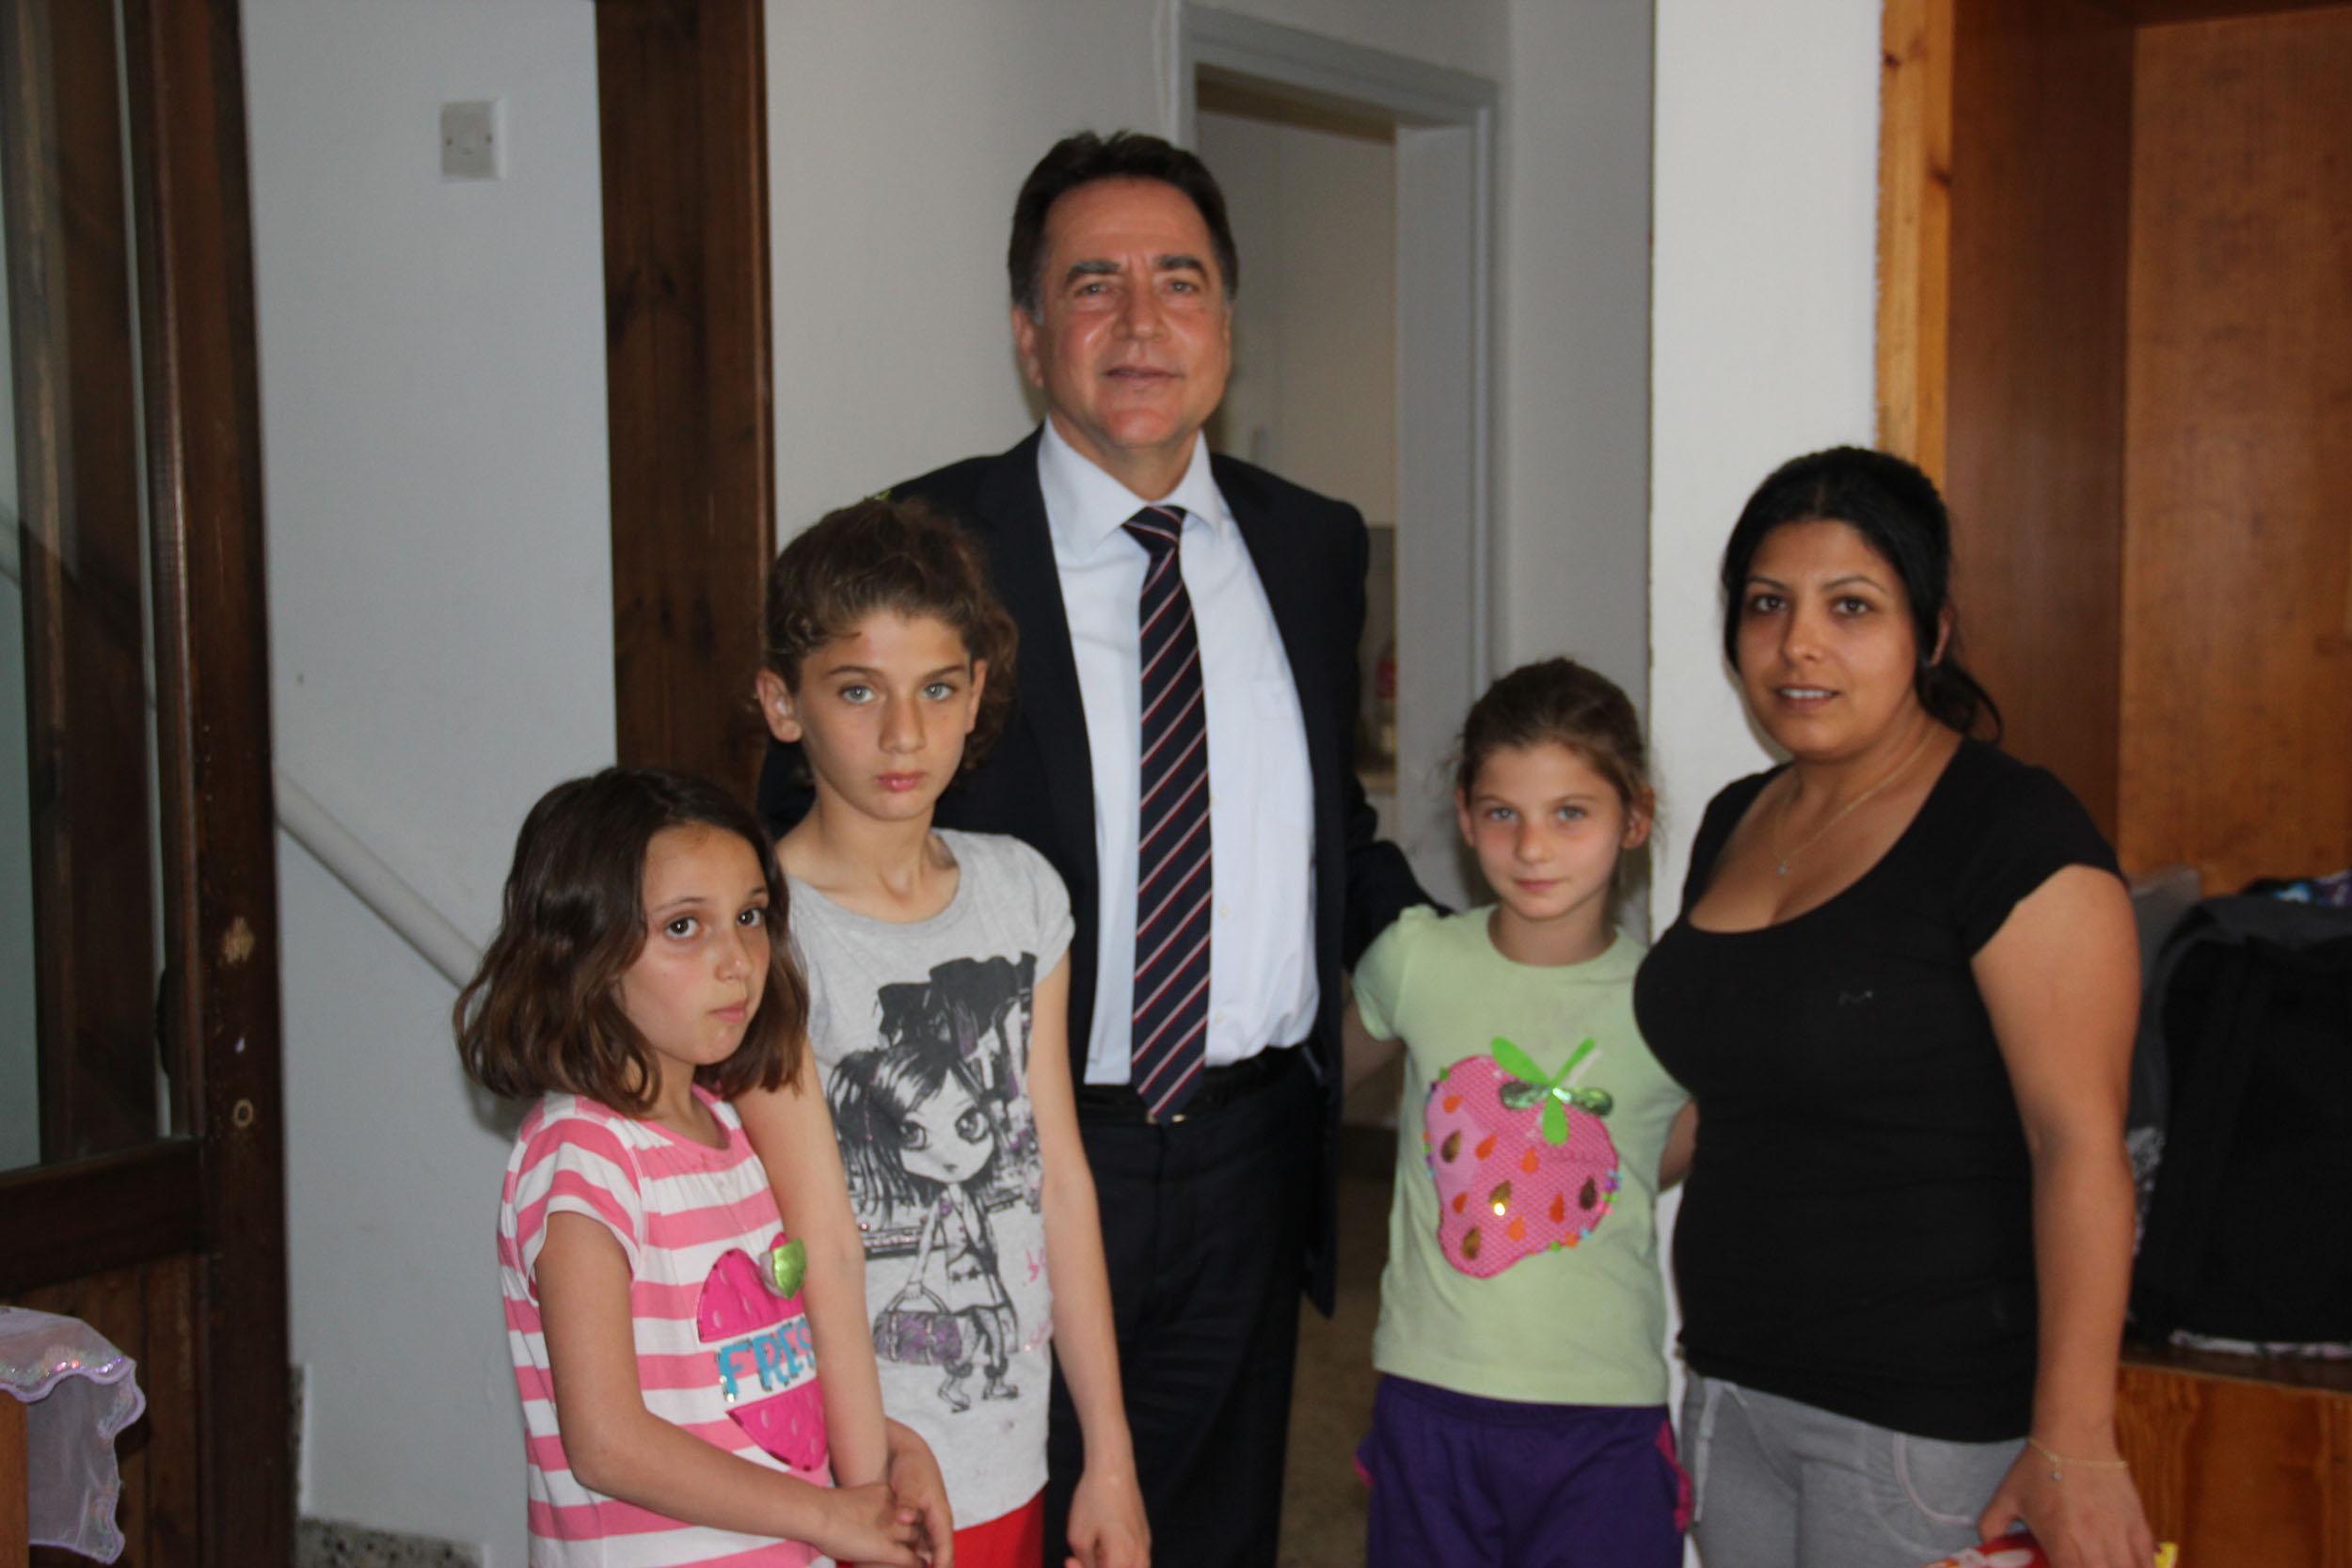 LTB BAŞKANI FELLAHOĞLU SOS ÇOCUK KÖYÜNÜ ZİYARET ETTİ